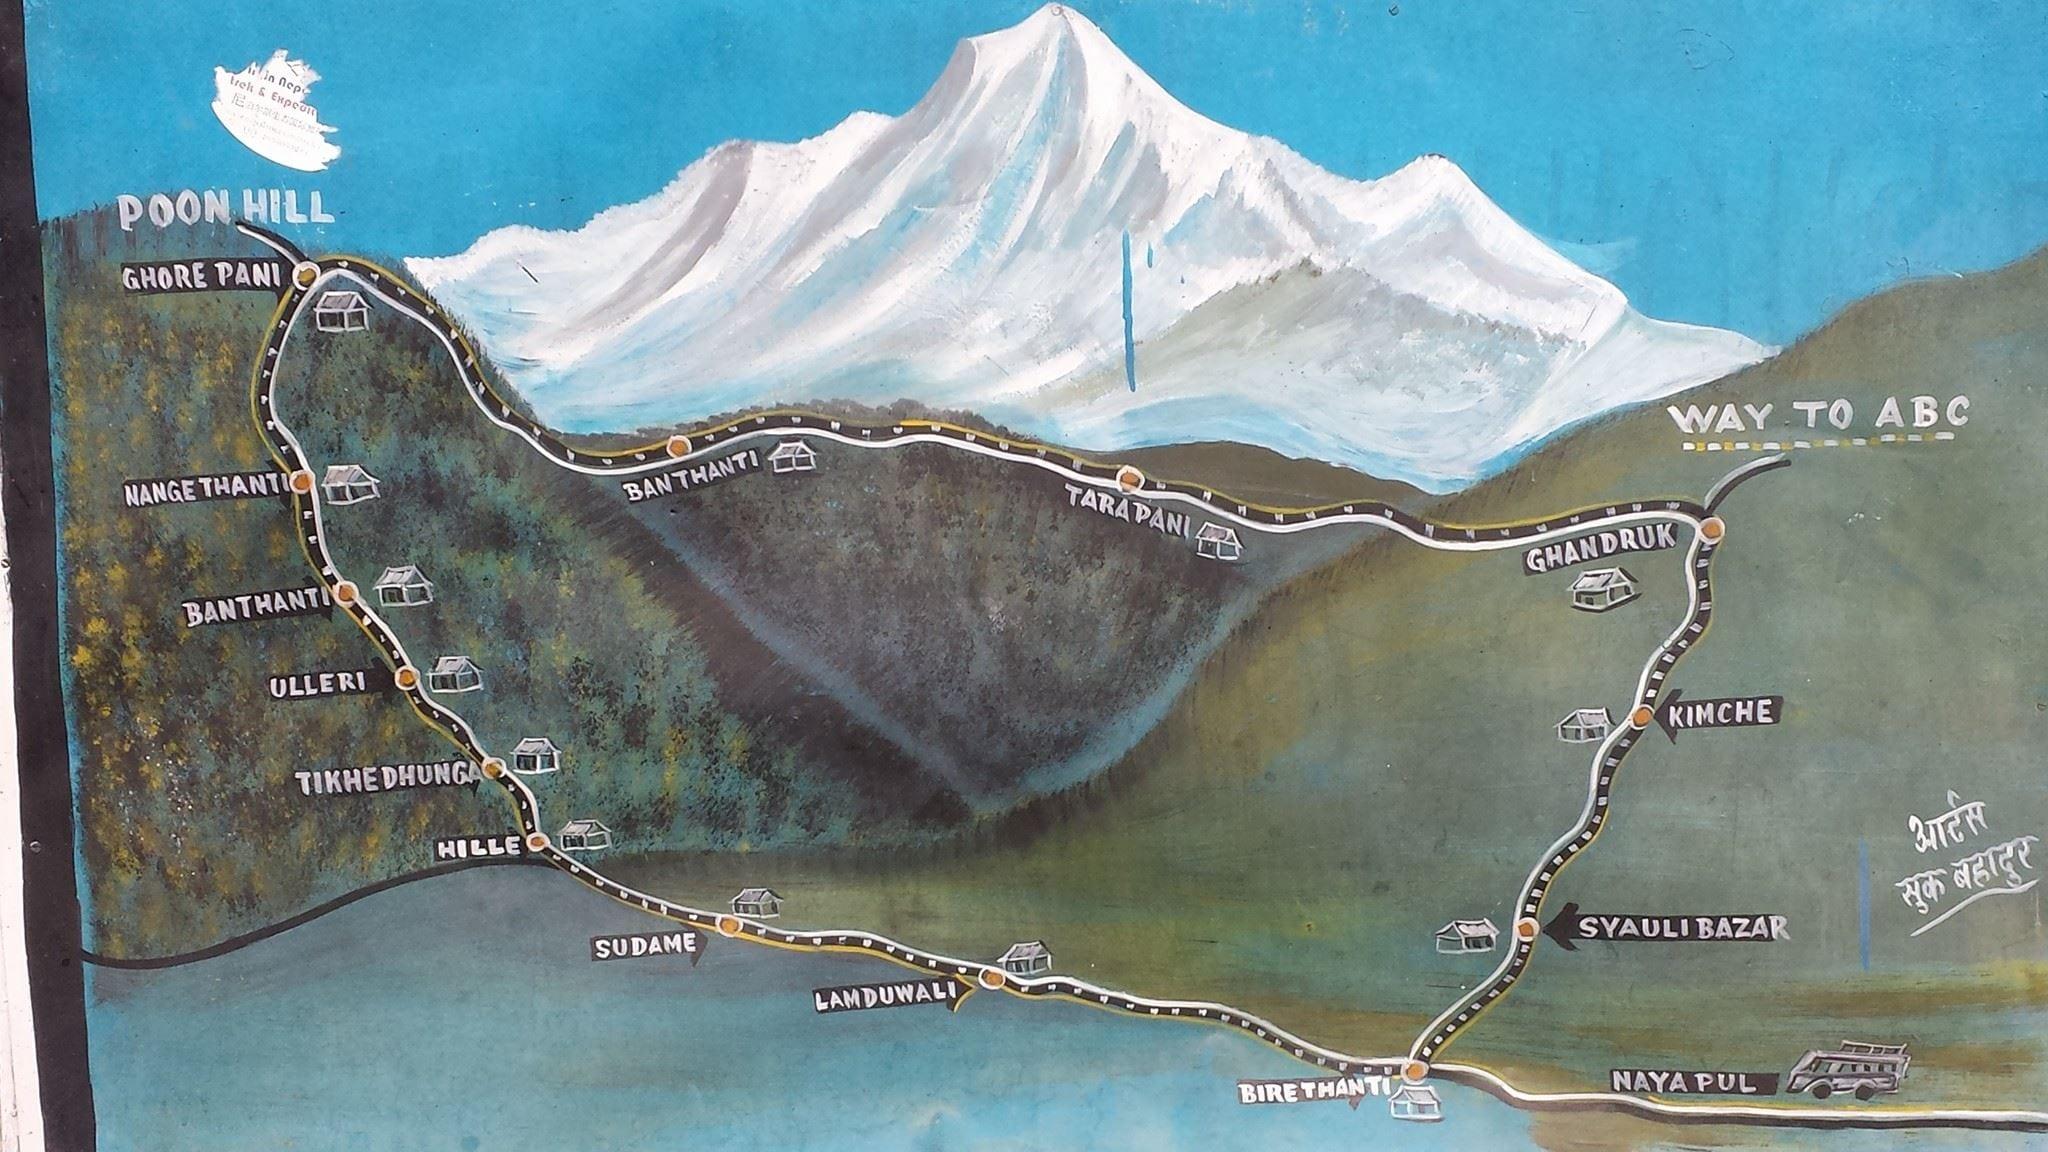 Map of the Ghorepani Poon Hill trek